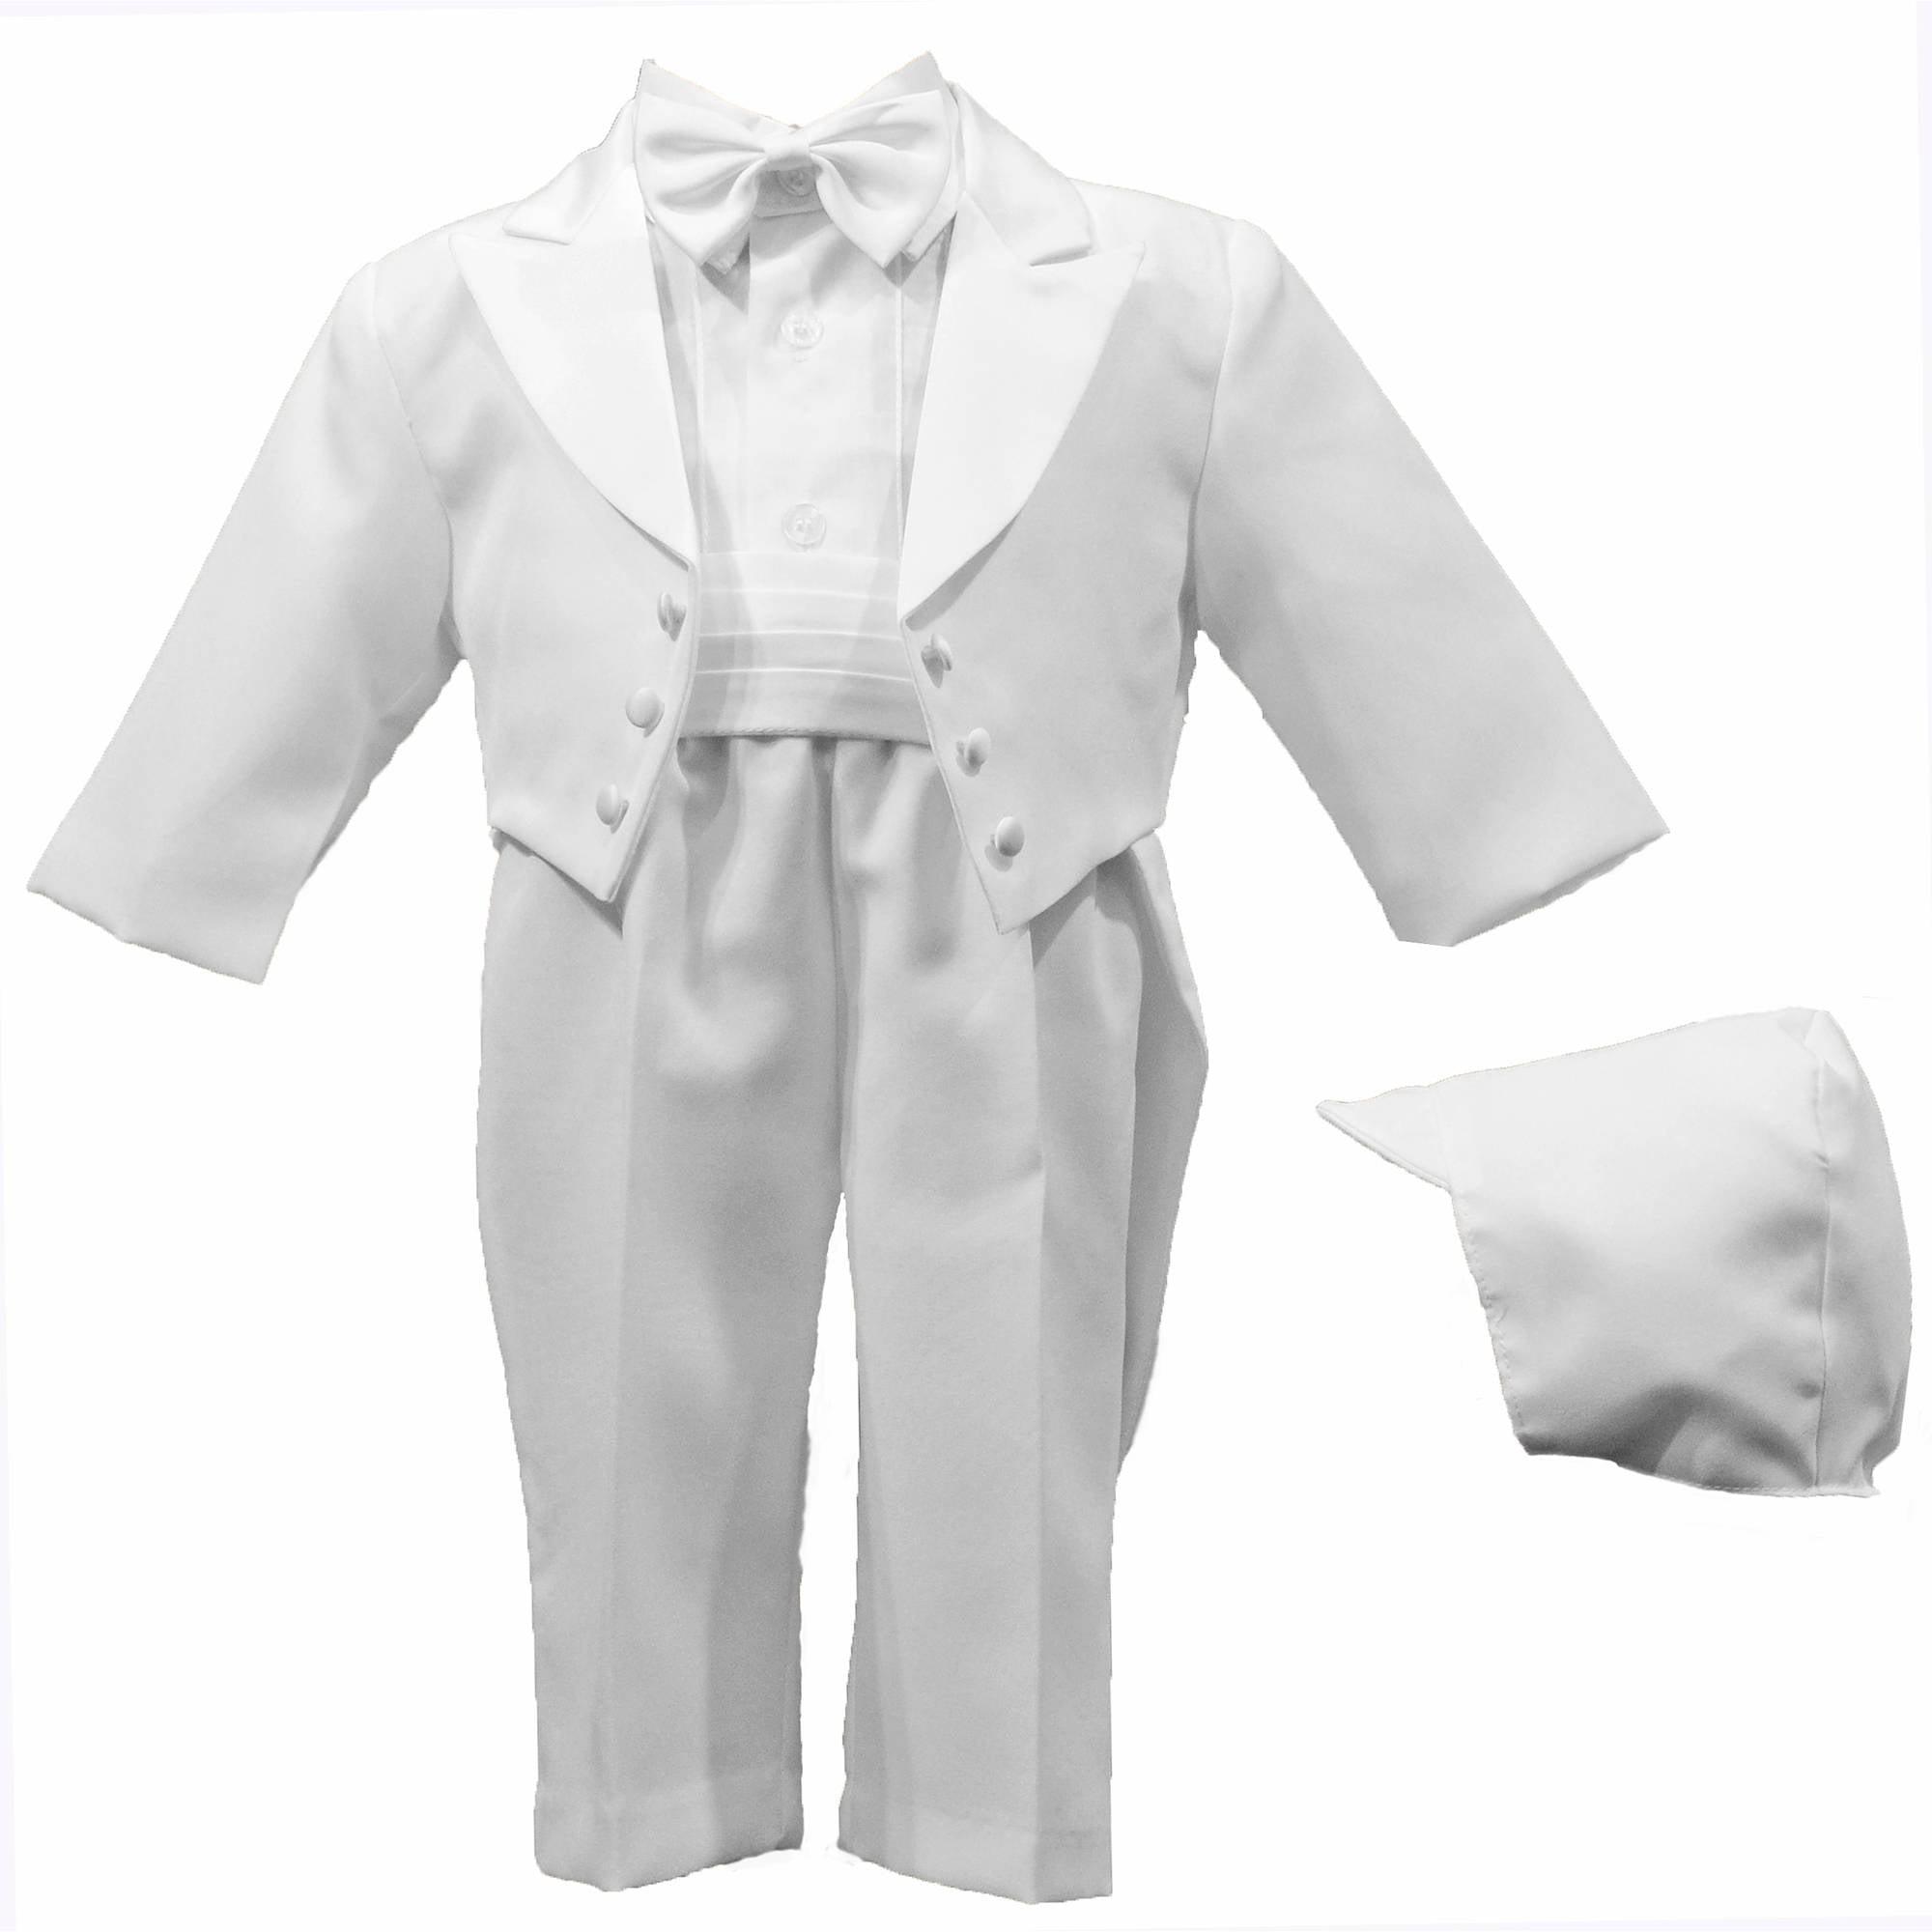 d158e1e41 Sophias Style - Baby Boys White Cotton Cross Applique Christening ...